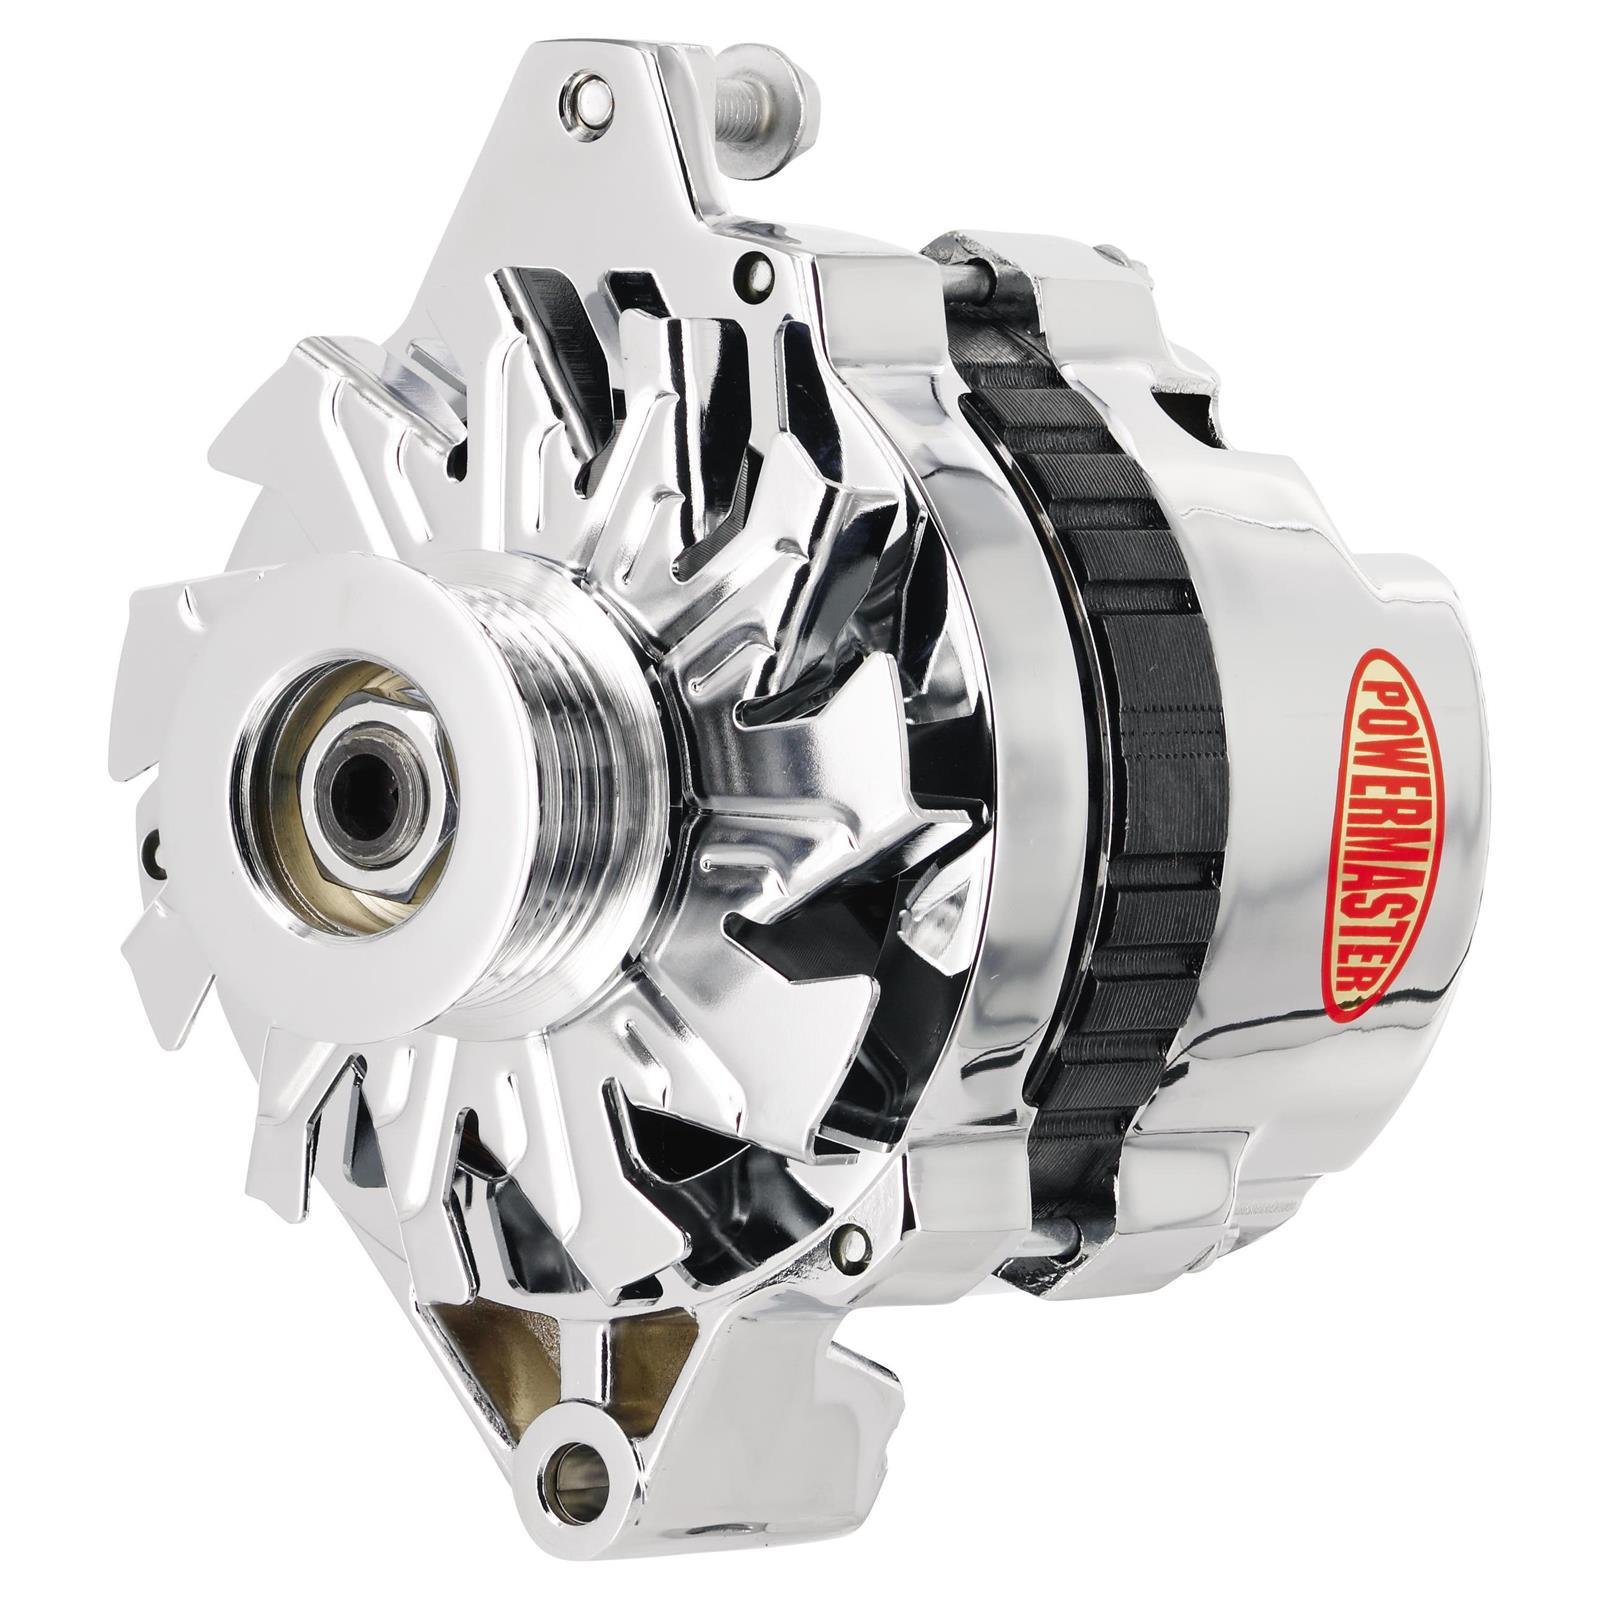 Powermaster 37802 Street Alternator 140a Serpentine 12v Gm Wiring 60 Amp